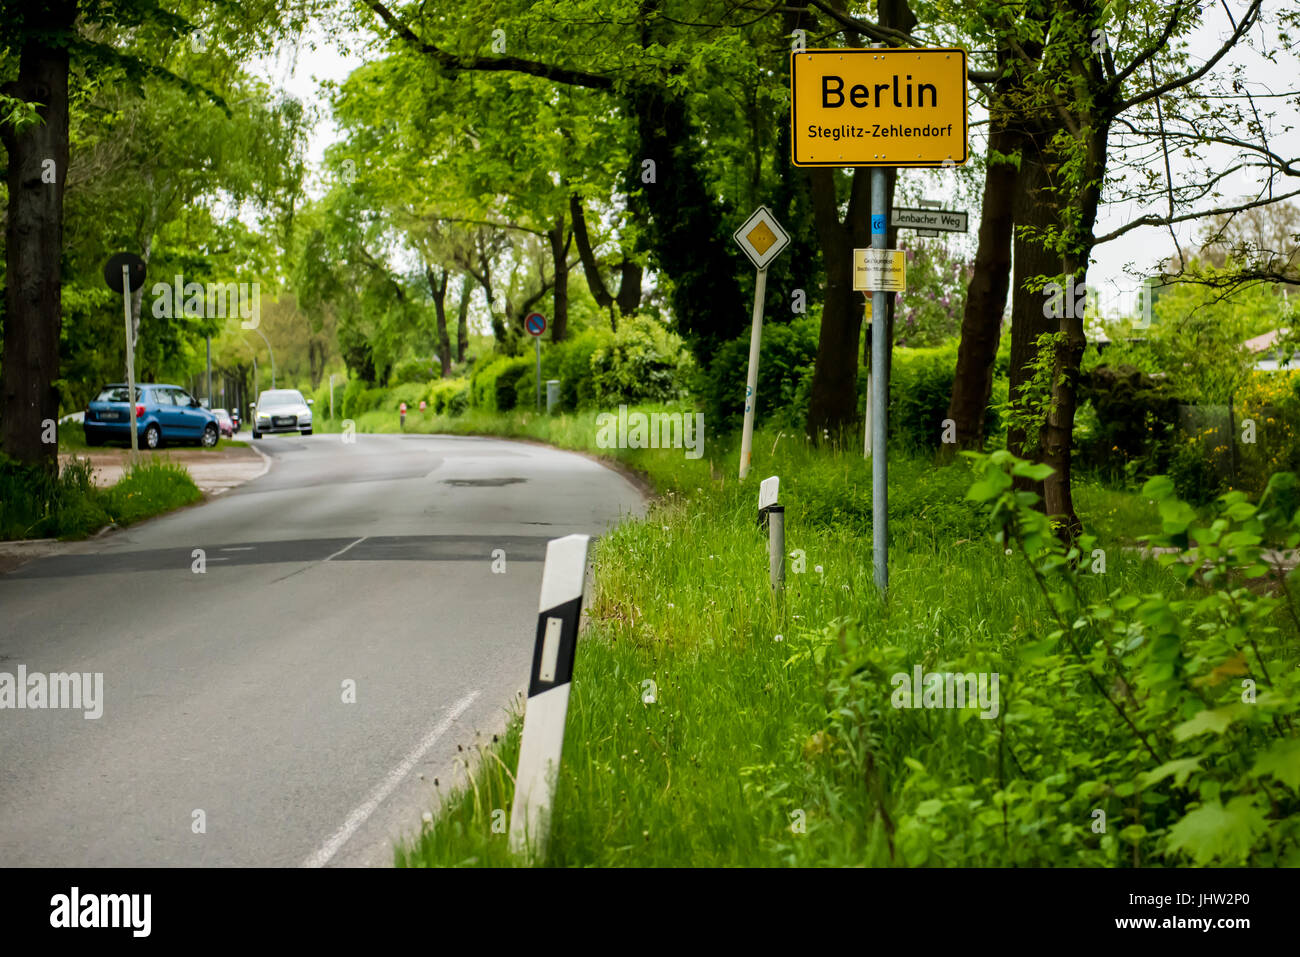 Stadt Berlin Informationen Straßenschild Stockfoto